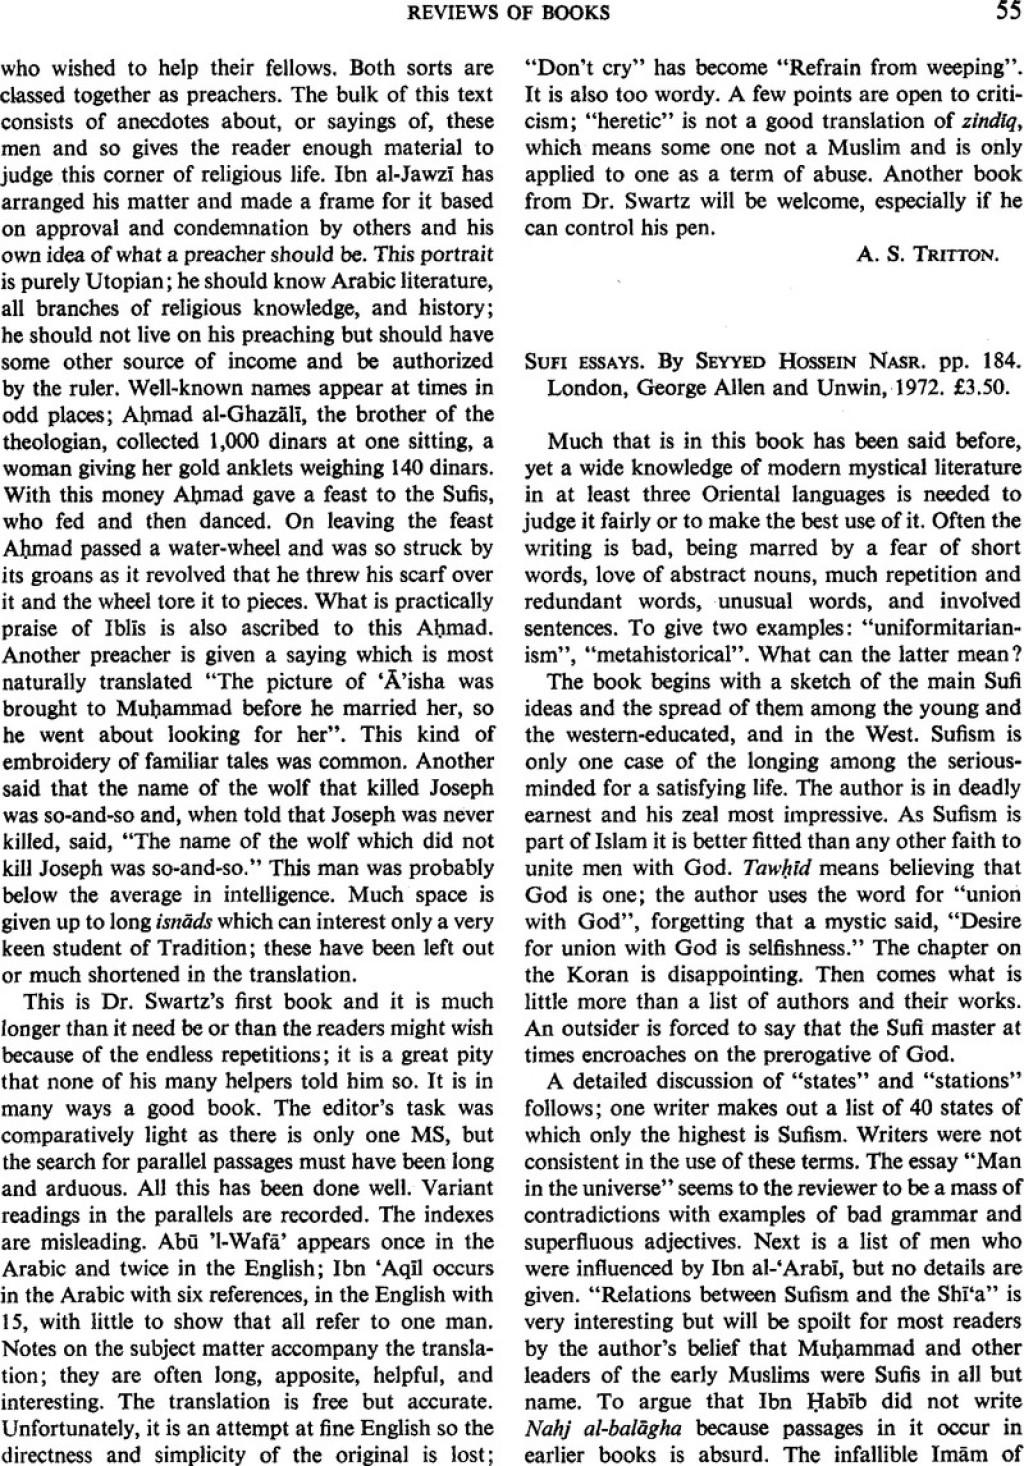 004 Sufi Essays Firstpage S0035869x00131466a Essay Singular Seyyed Hossein Nasr Pdf Large